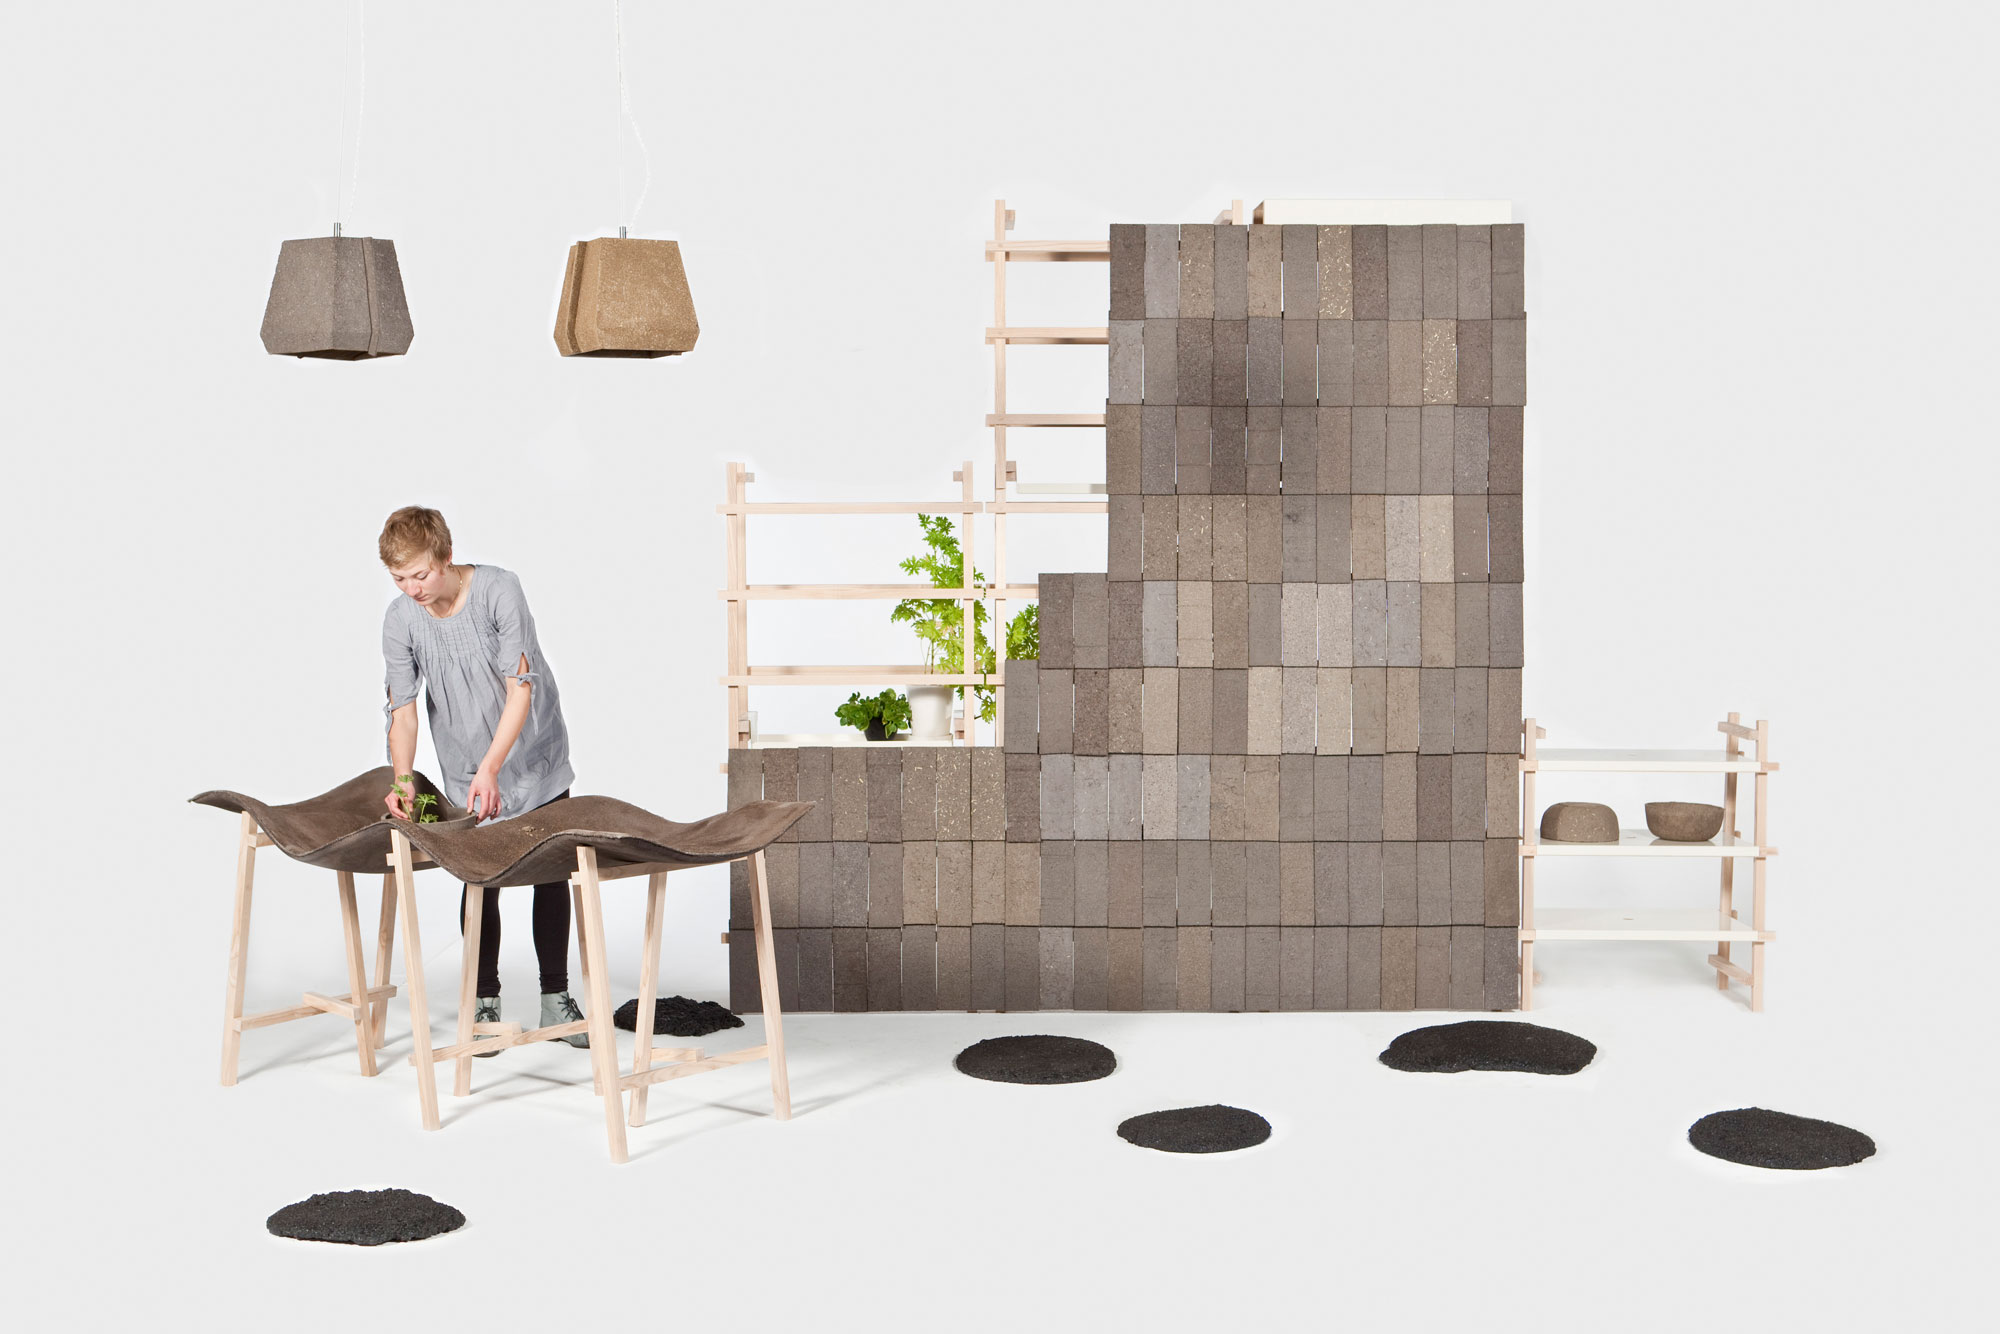 Design Messe Berlin | Domestic Landscape Wohnen Mit Erde Kunststiftung Des Landes